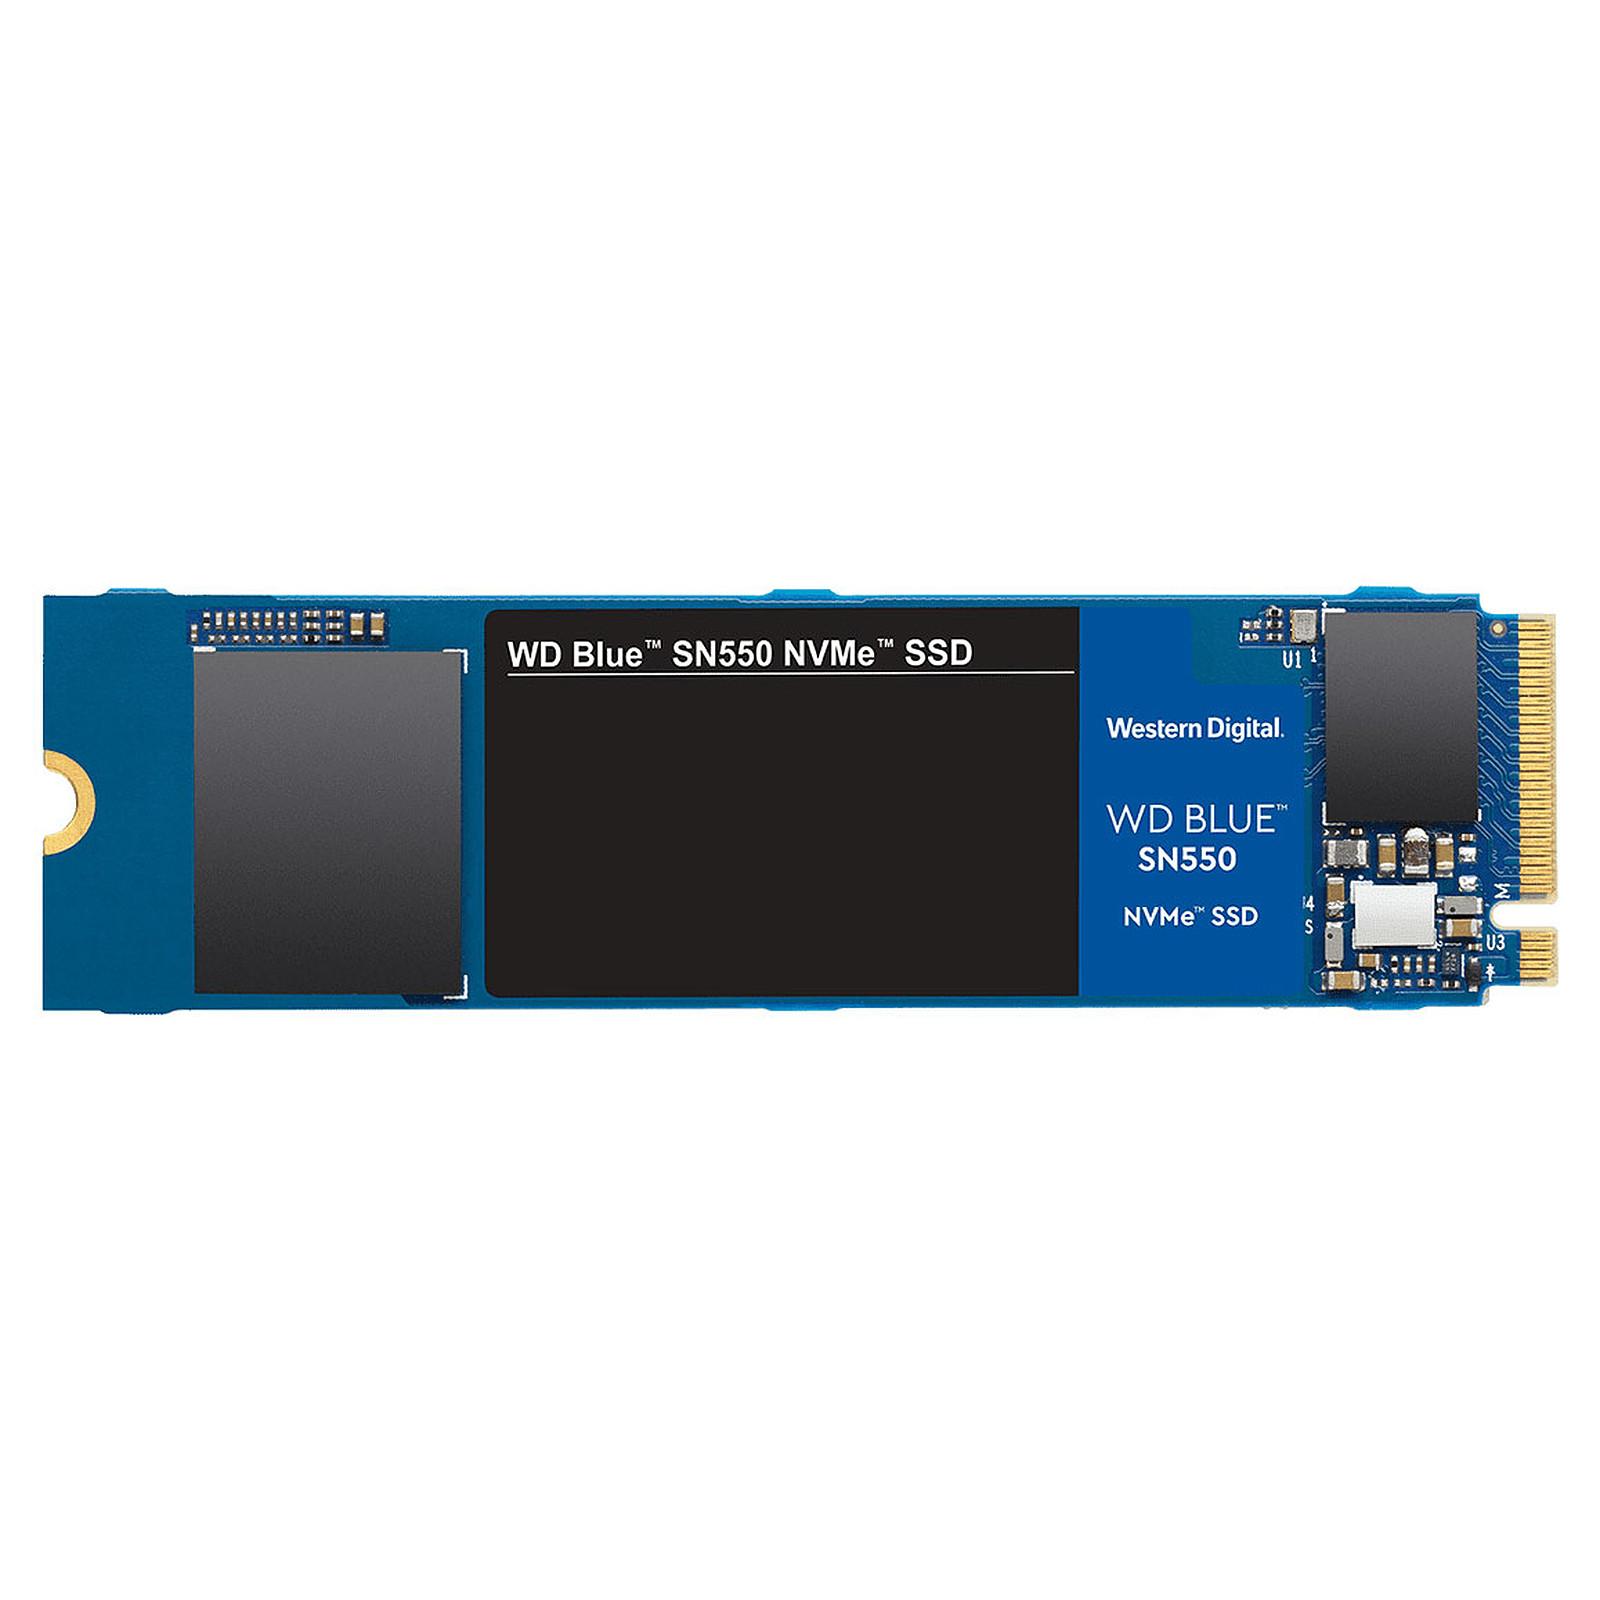 WD WDS500G2B0C 480-525Go M.2 - Disque SSD WD - Cybertek.fr - 1